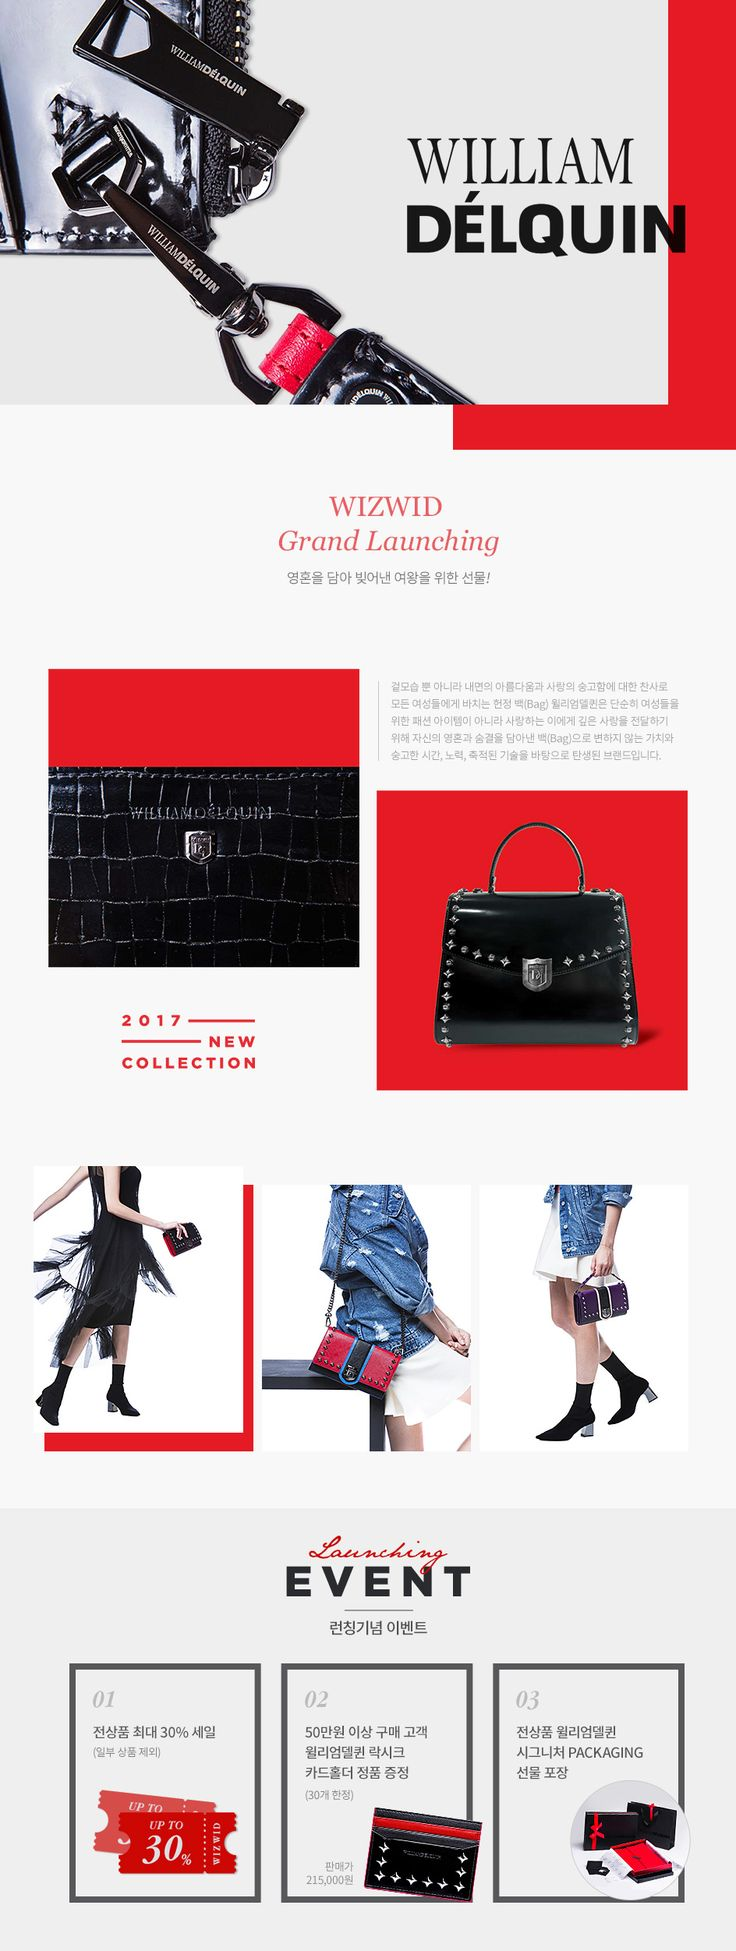 WIZWID:위즈위드 - 글로벌 쇼핑 네트워크 여성 의류 소품 가방 우먼 패션 백 기획전 WILLIAM DELQUIN 모든 여성들에게 바치는 헌정백 윌리엄델퀸 위즈위드 런칭!